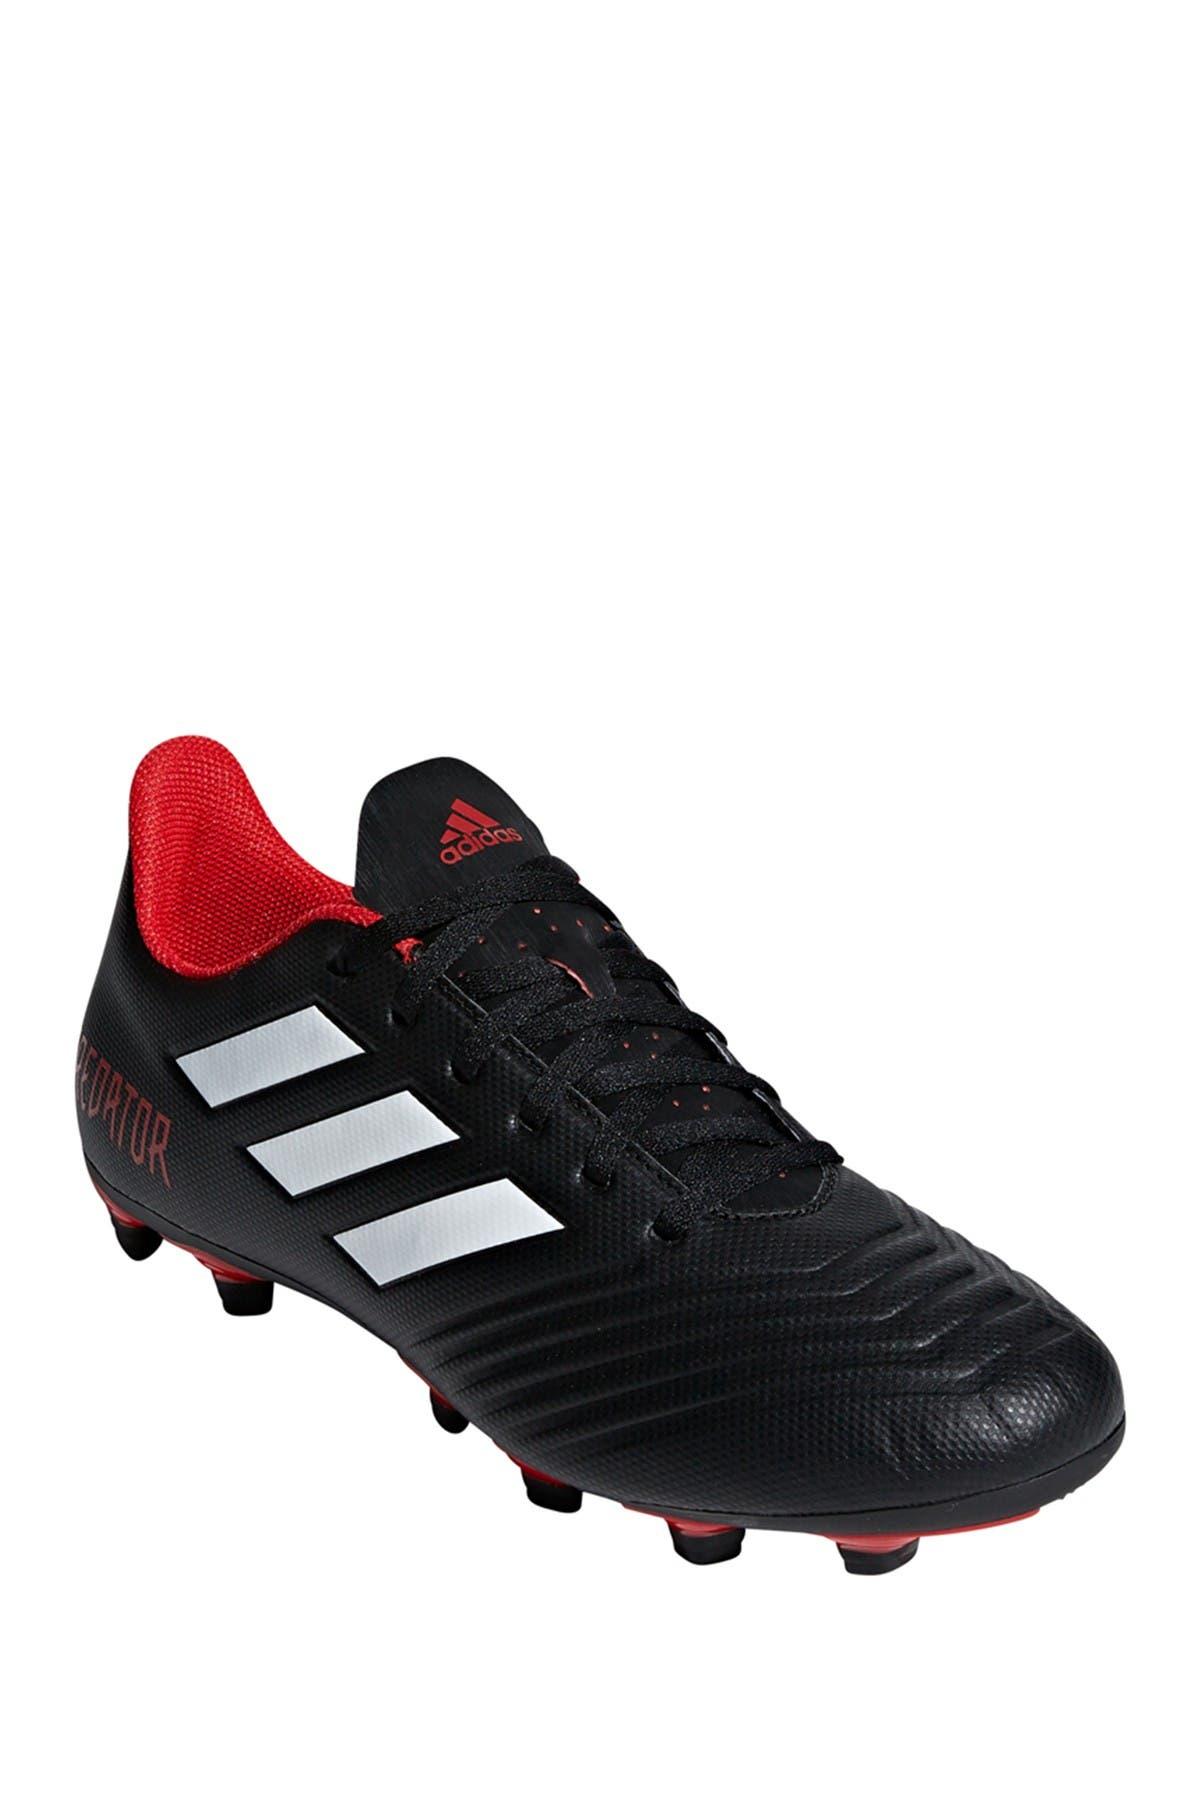 adidas | Predator 18.4 Flexible Ground